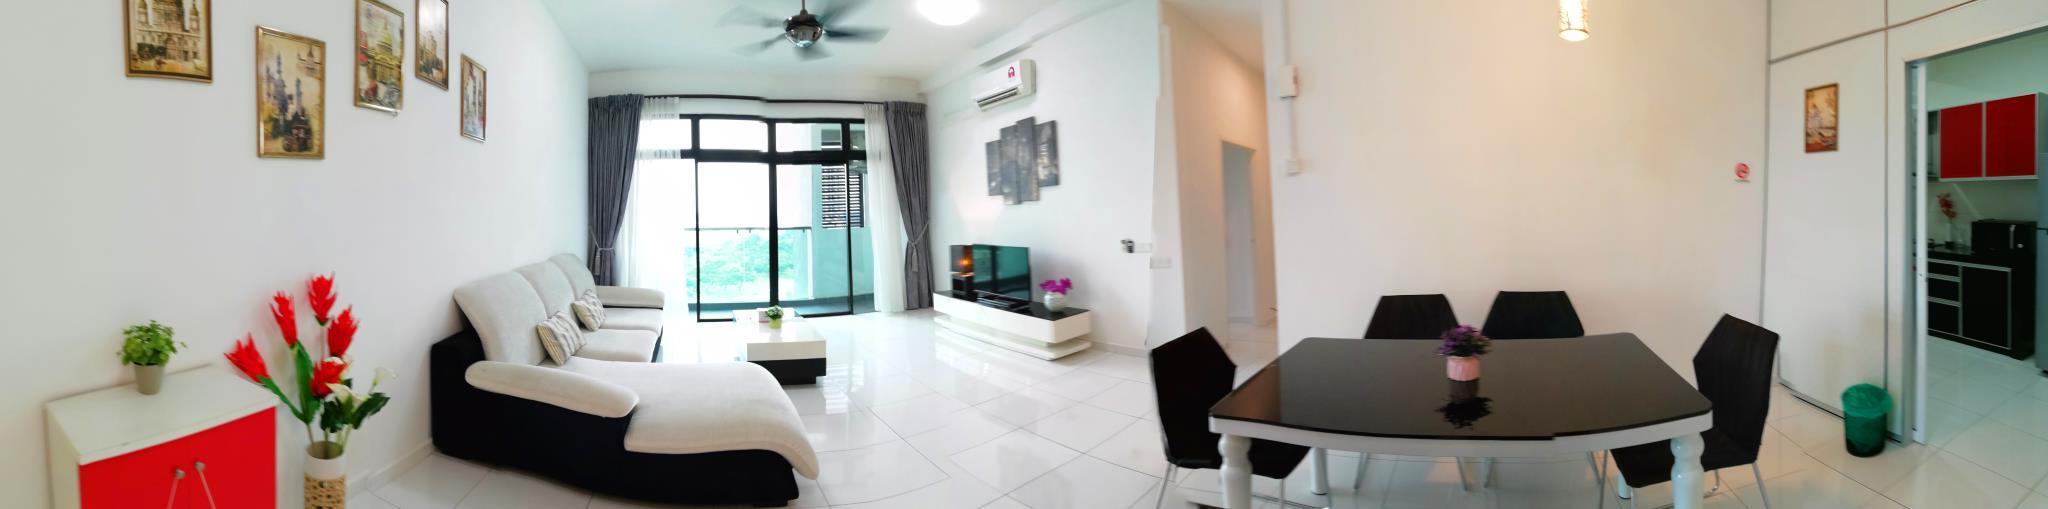 Saphire Homestay, Johor Bahru